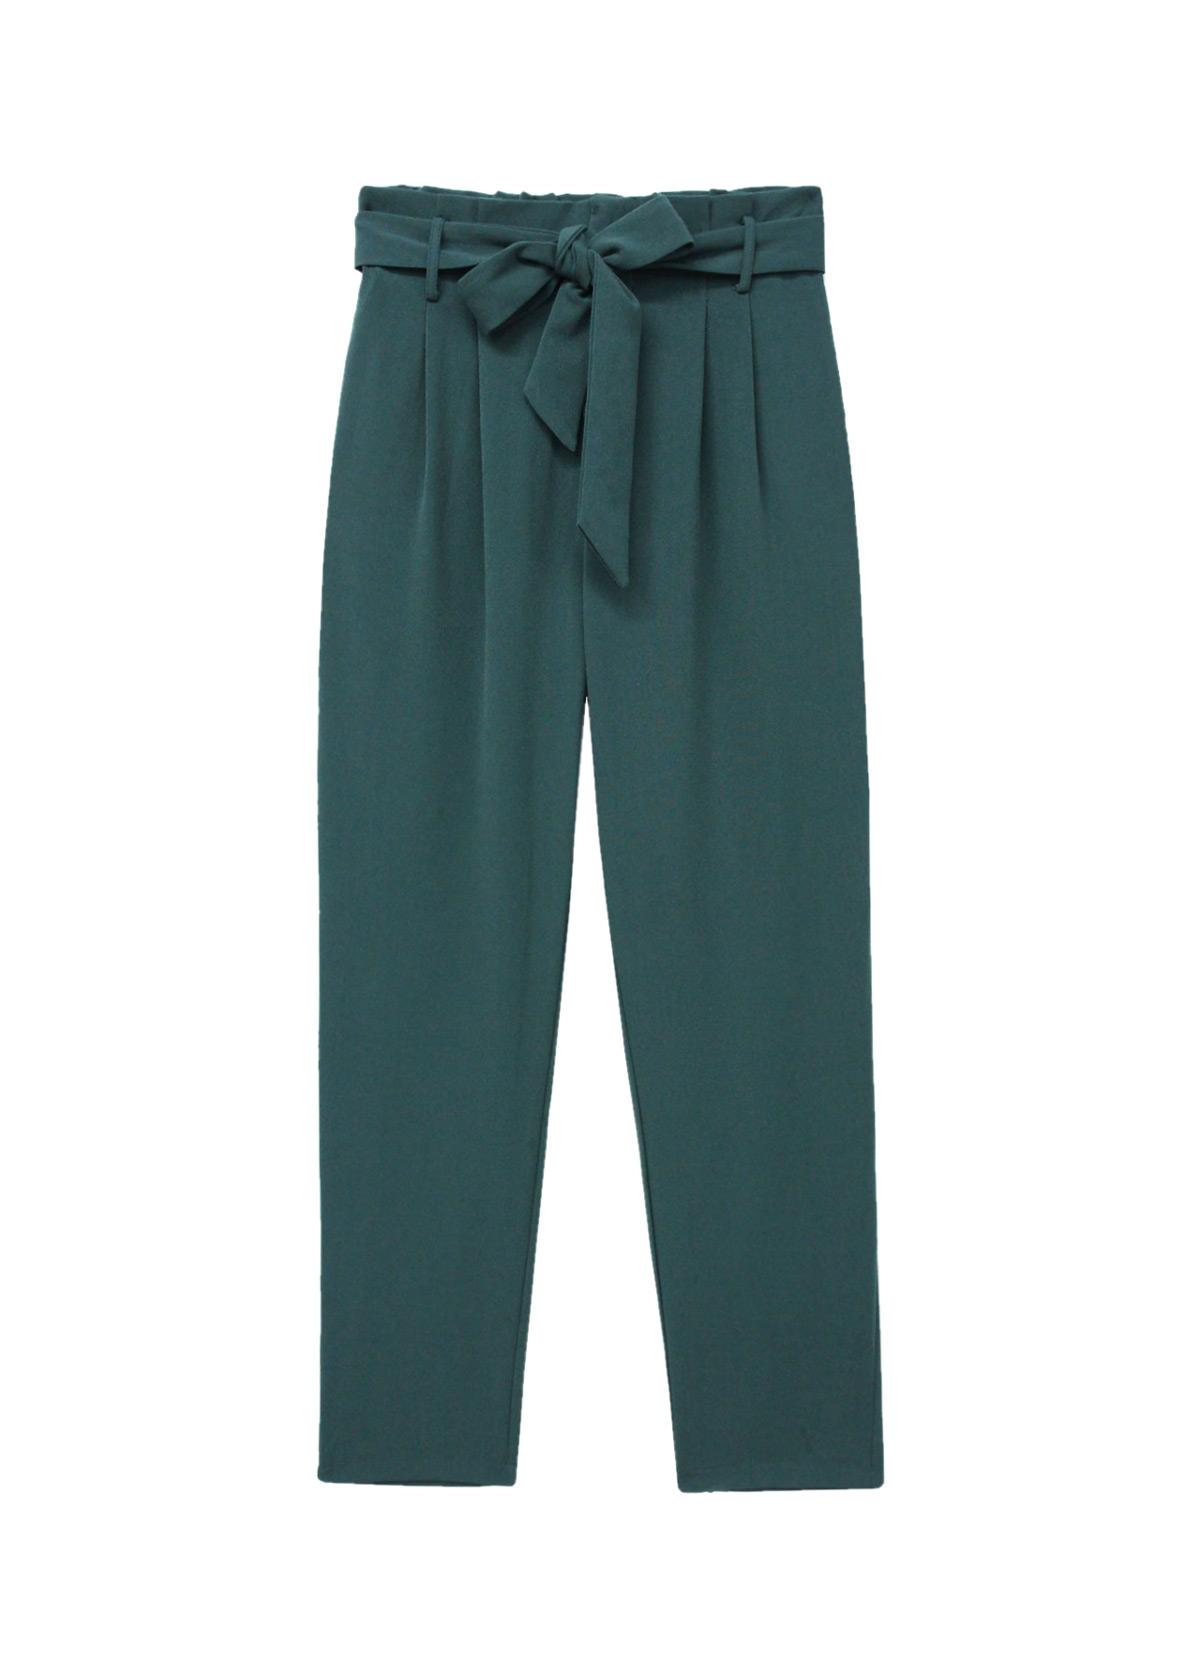 pantalon paperbag verde esmeralda